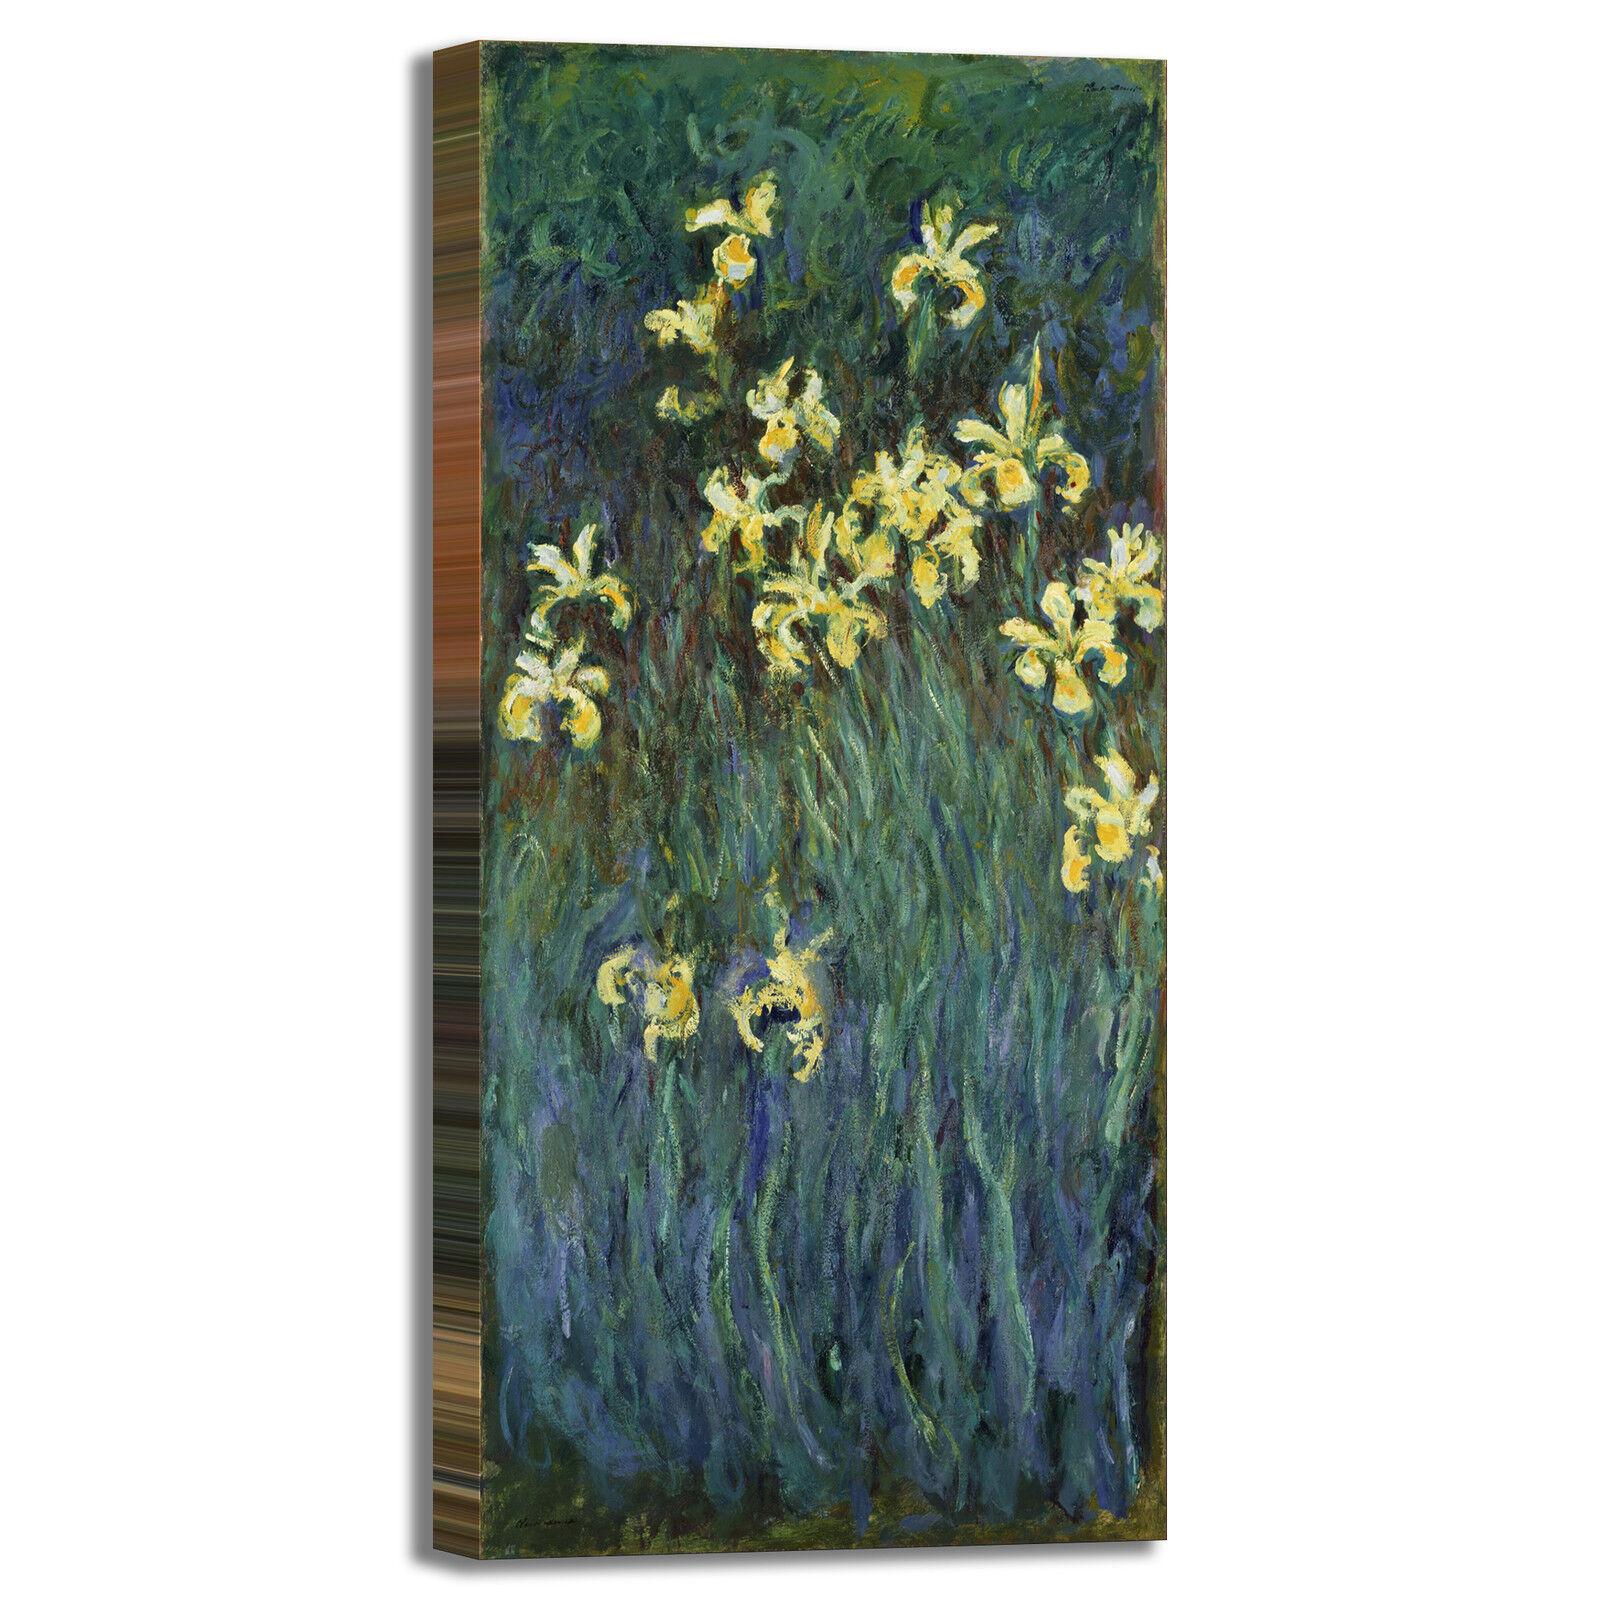 Monet iris Gelb design quadro stampa tela dipinto telaio arroto casa